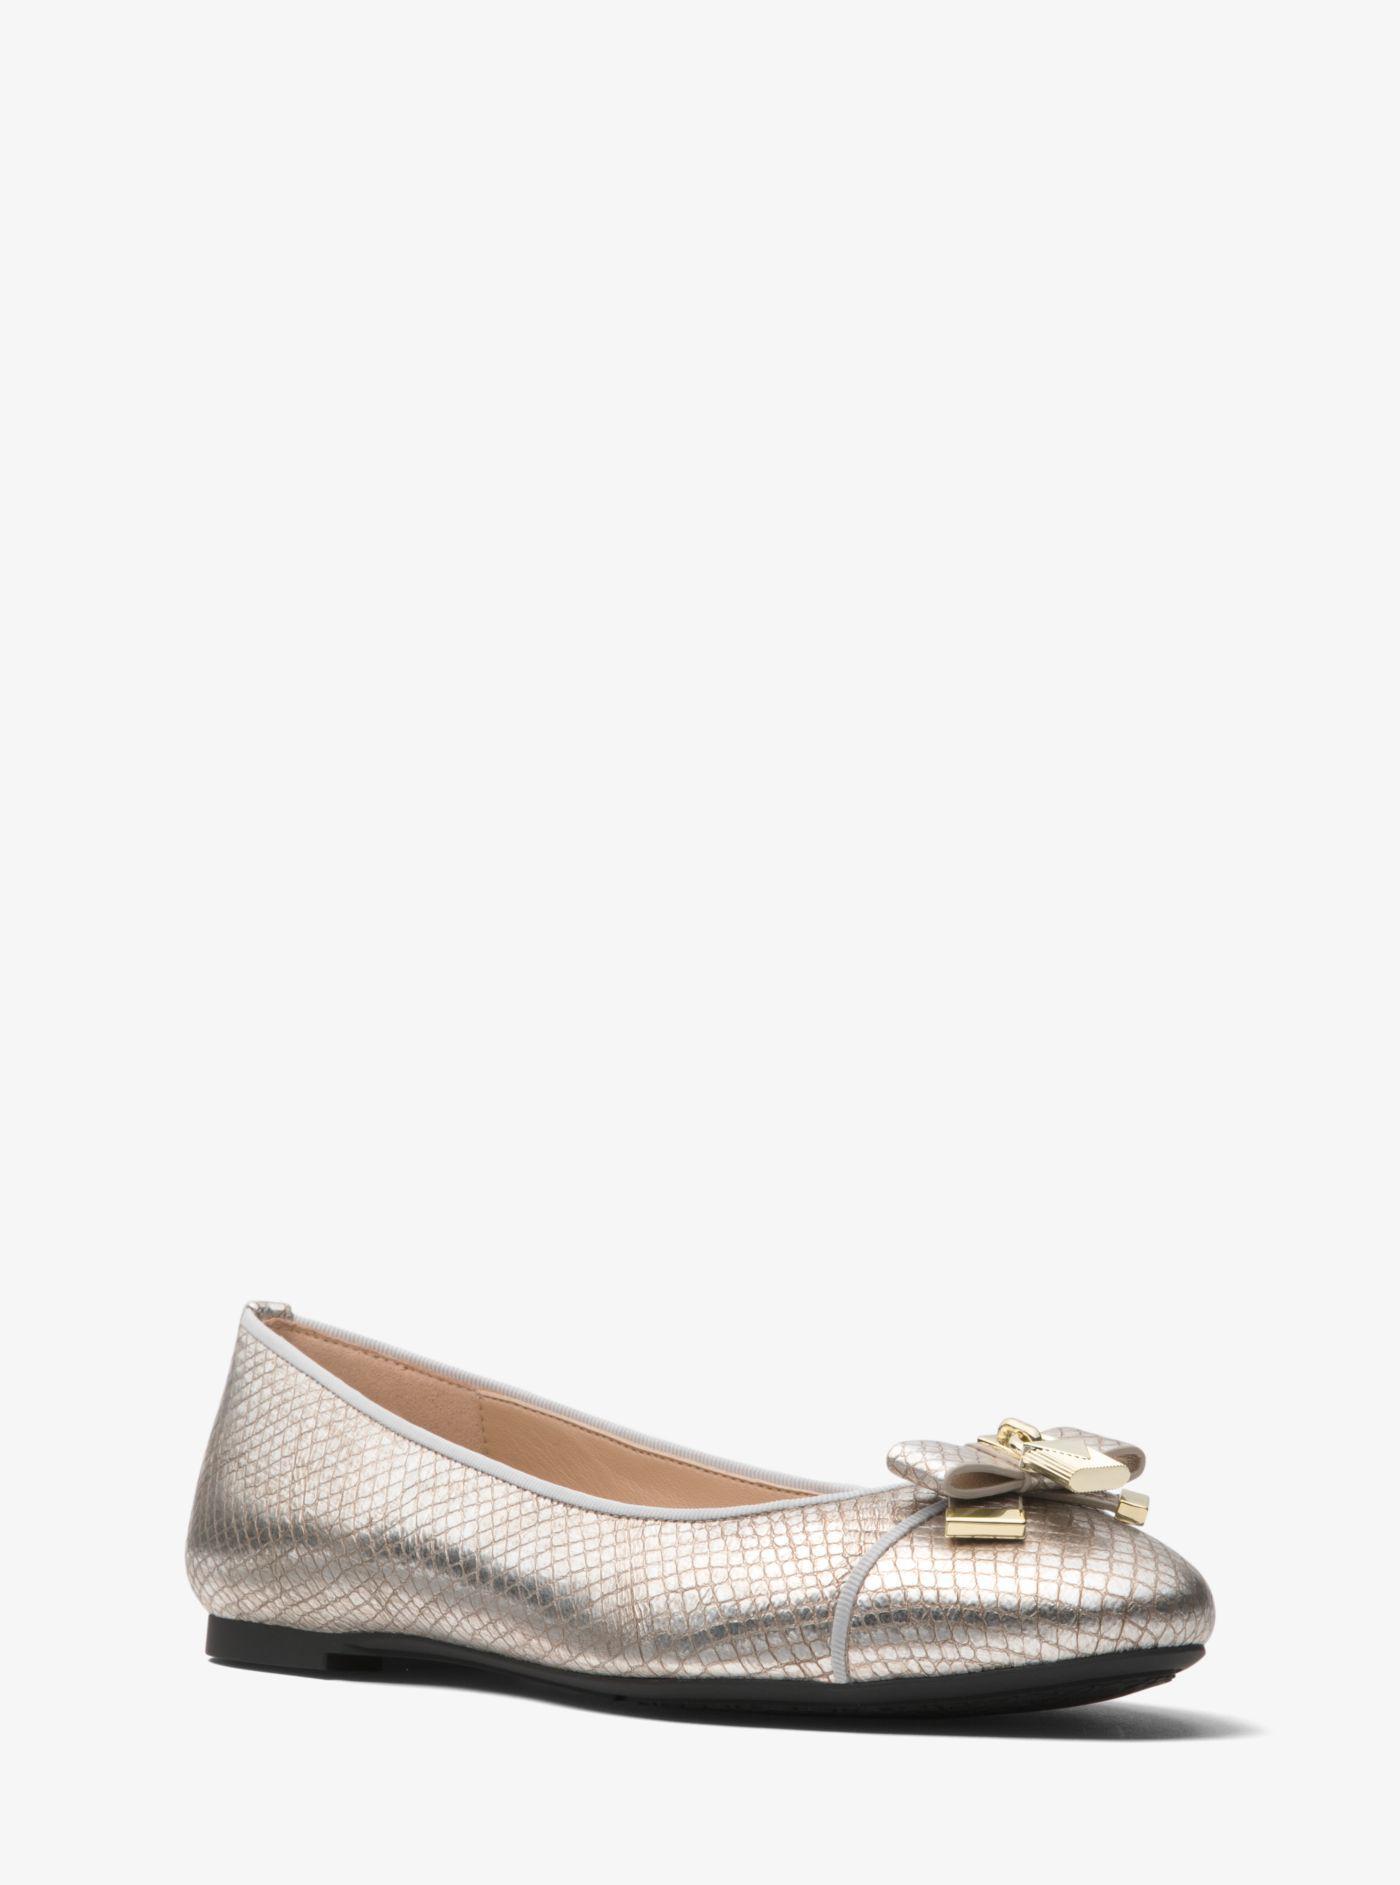 00cefb331406f Lyst - Michael Kors Alice Metallic Snakeskin Ballet Flat in Metallic